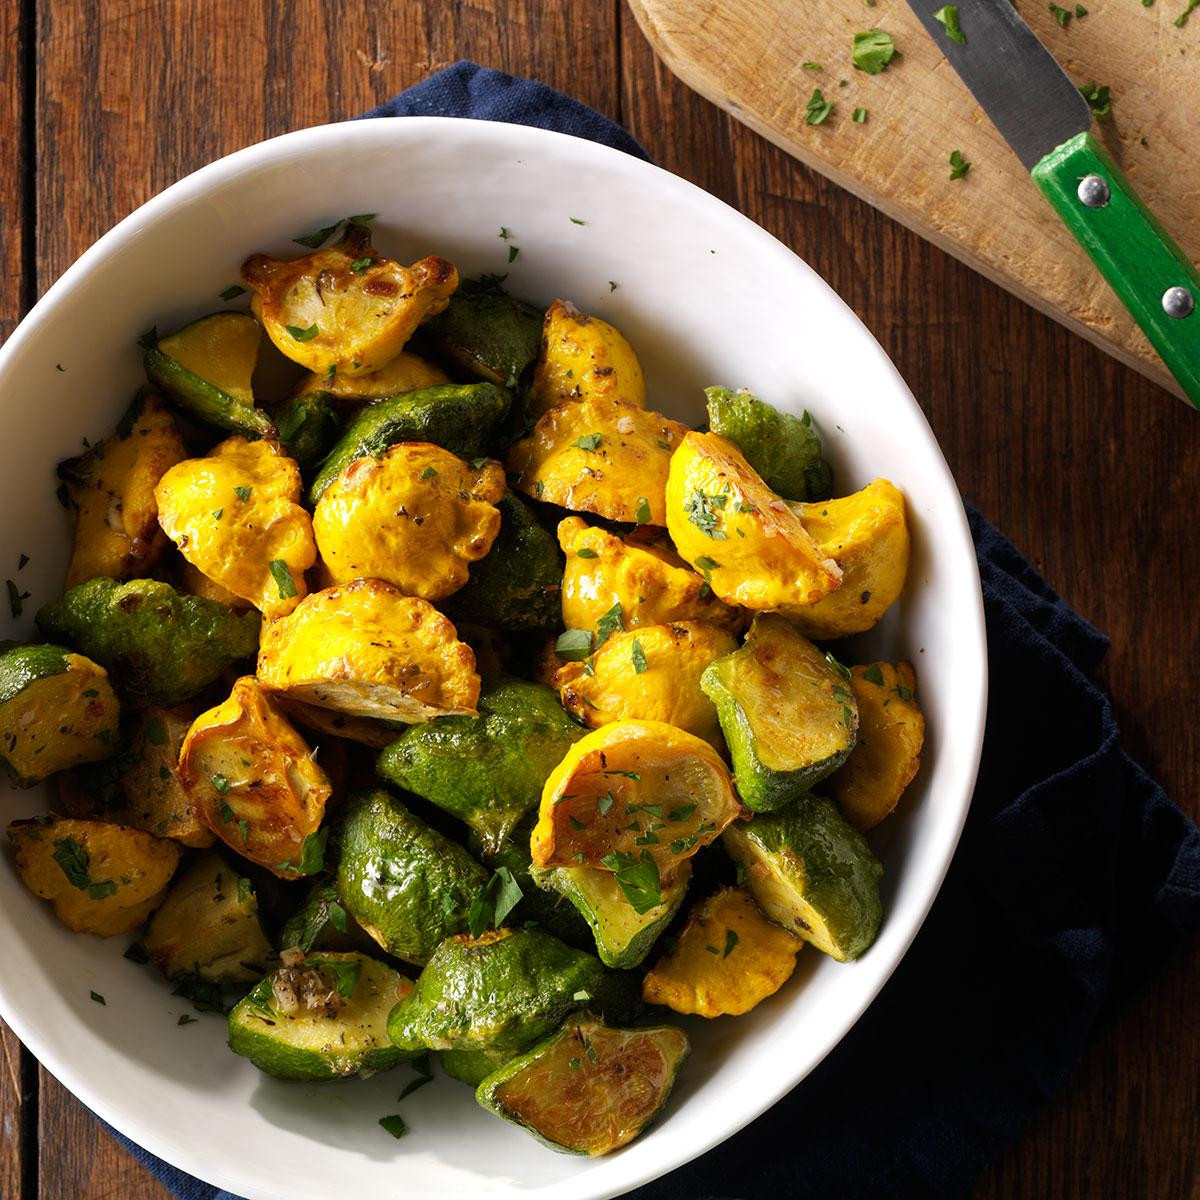 Summer Squash Recipe  Garlic Herb Pattypan Squash Recipe